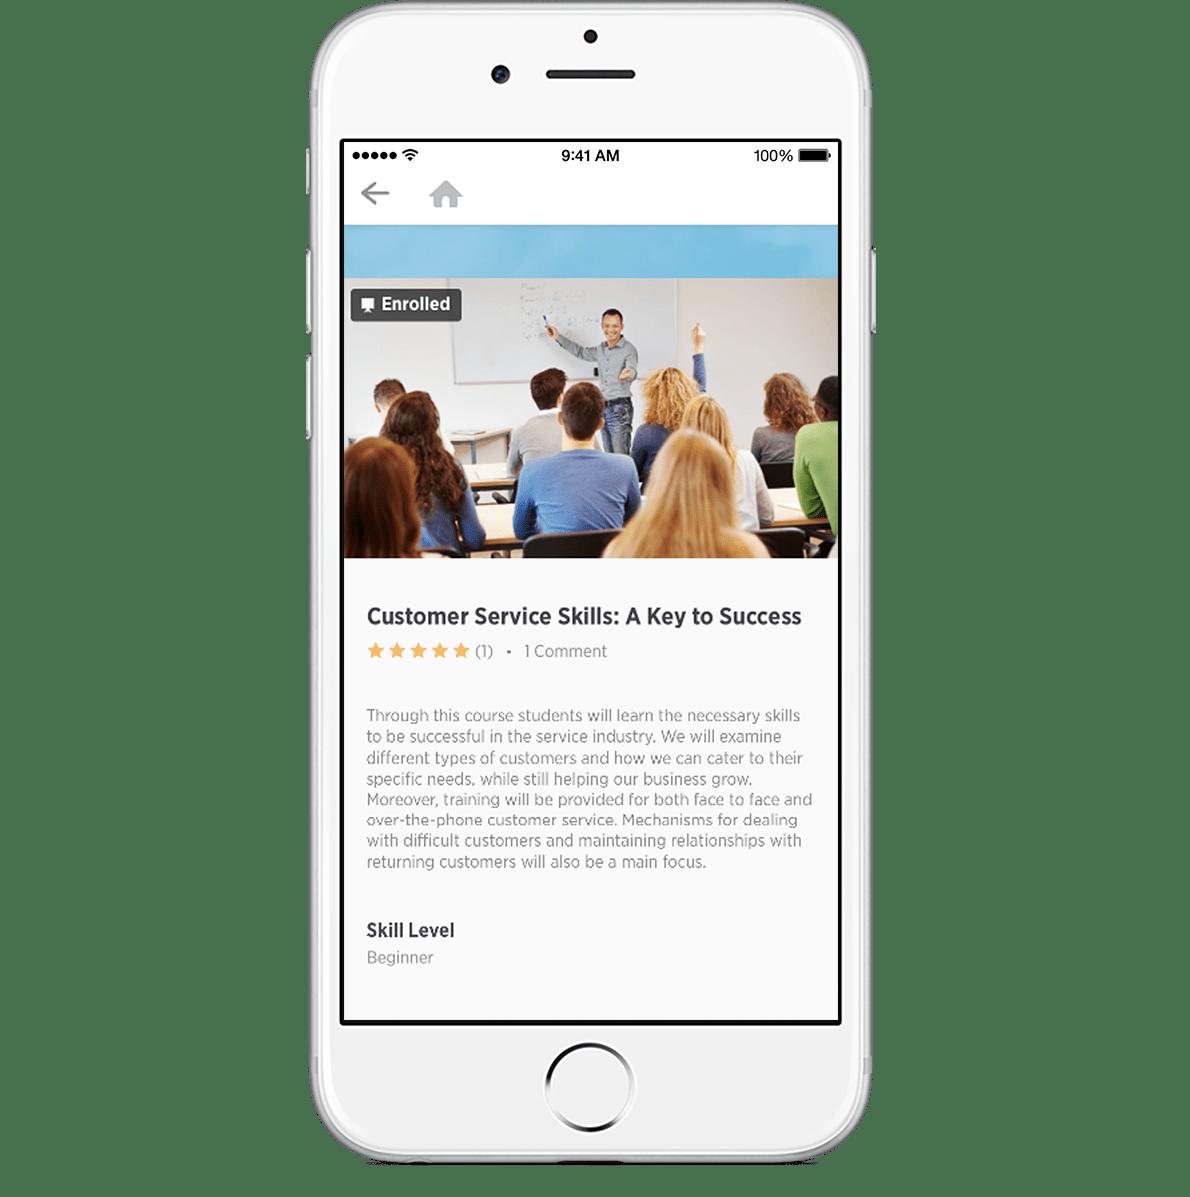 Resume Builder Unc Best Online Homepage University Career Center